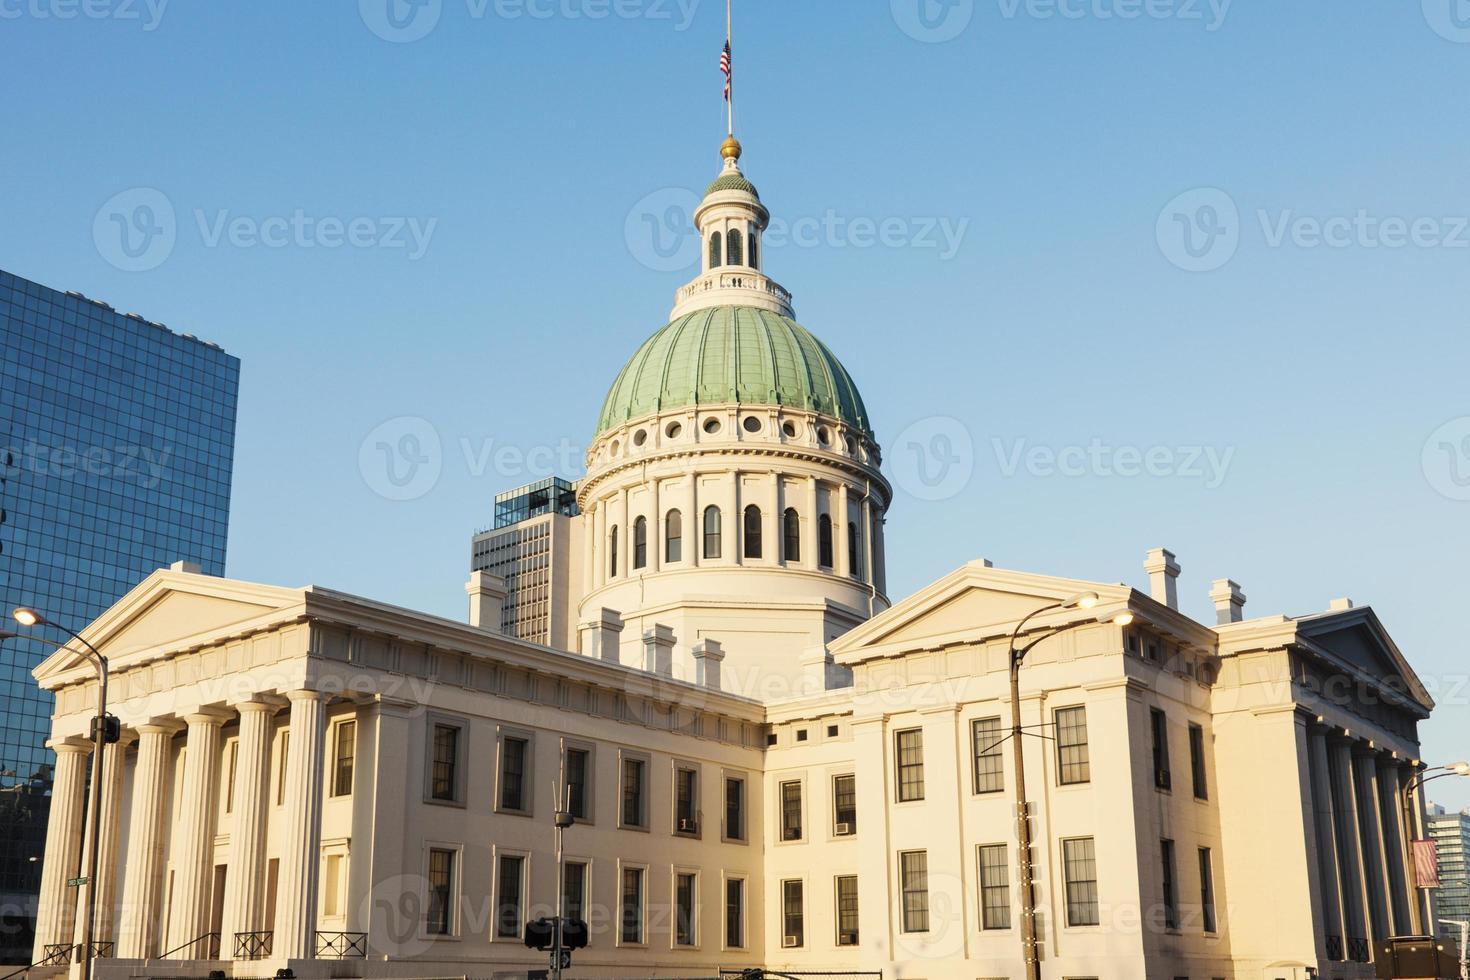 antigo tribunal em st. Louis St. Louis, Missouri foto